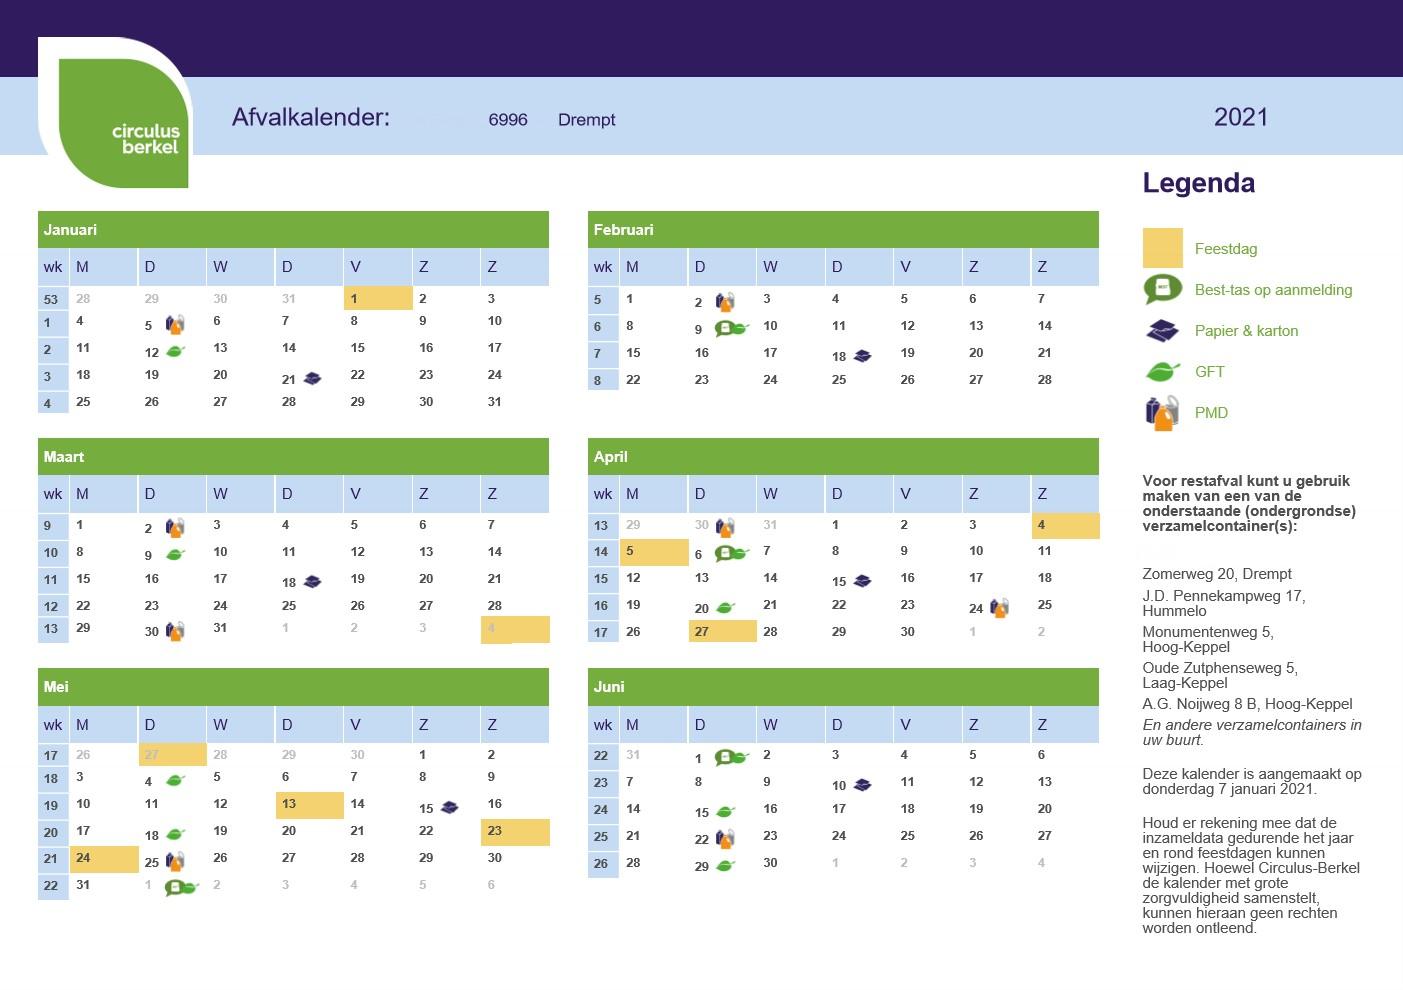 Afvalkalender 6996 Drempt 2021 (januari t/m juni)